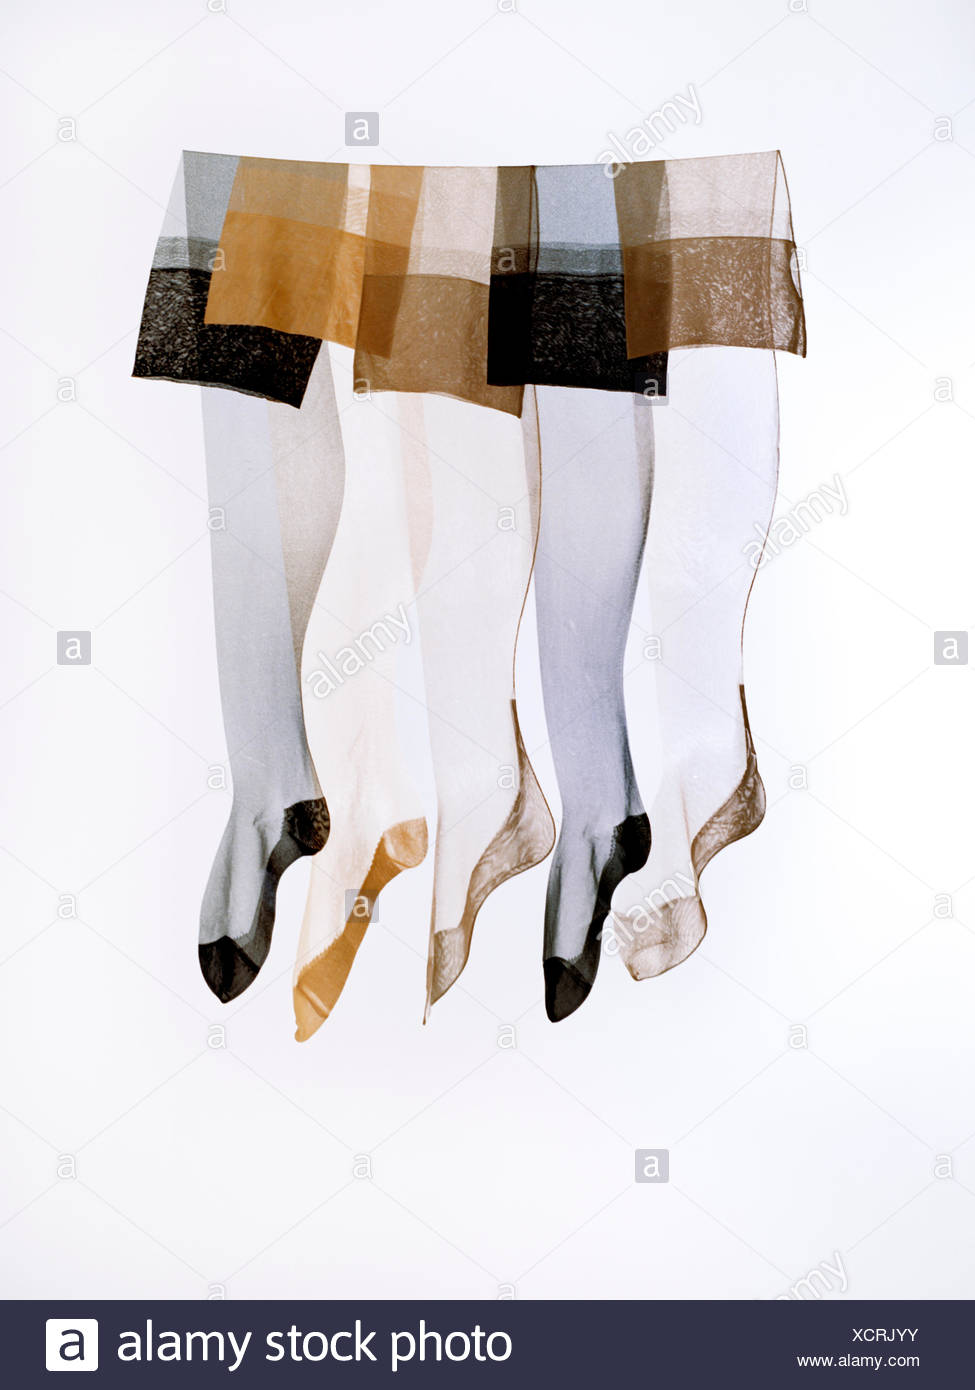 Nylon stockings against a white background. - Stock Image